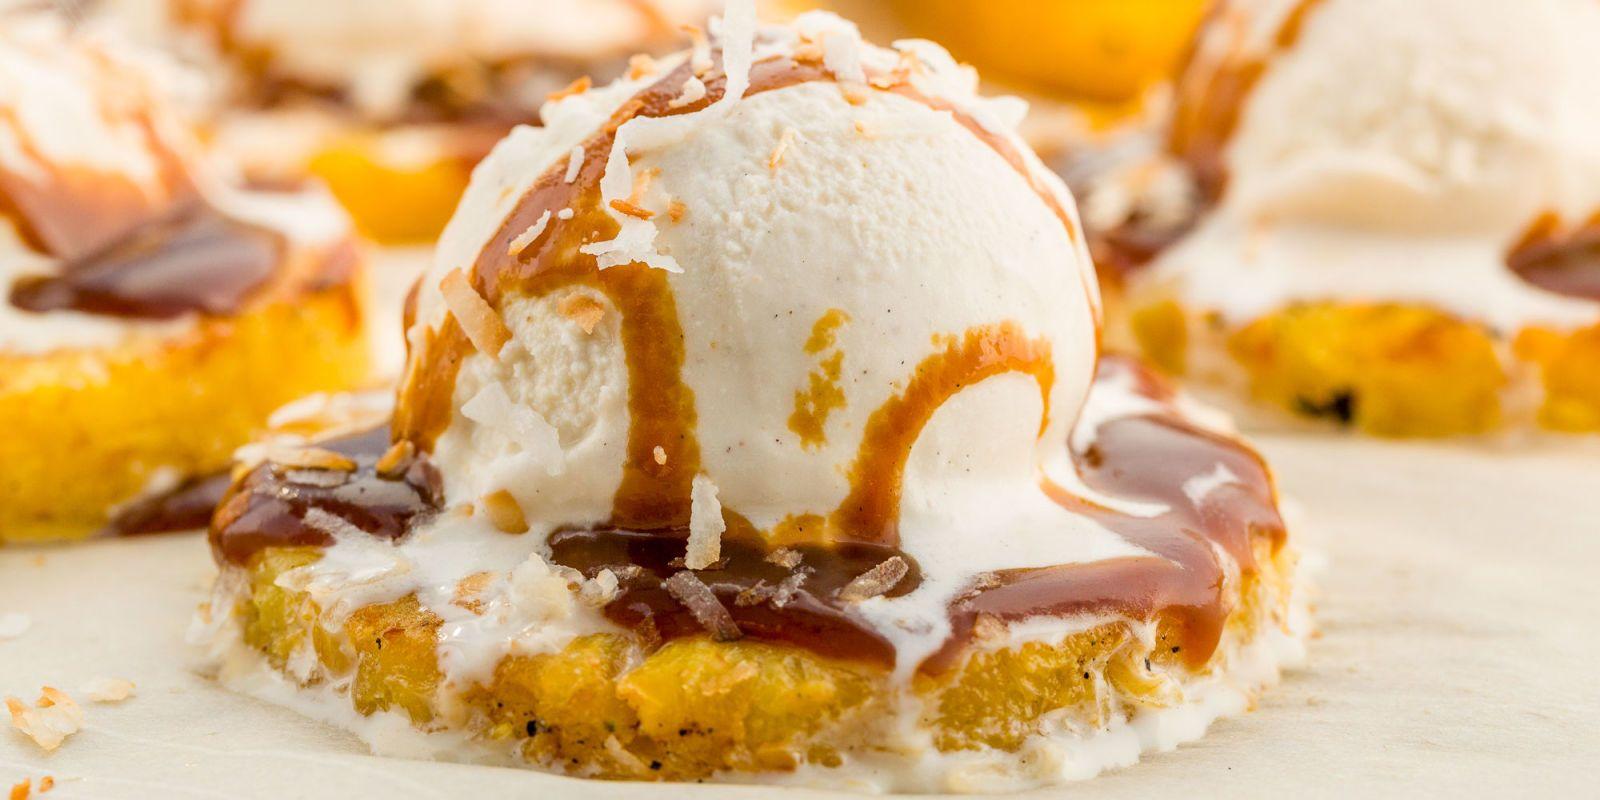 Sweet Desserts